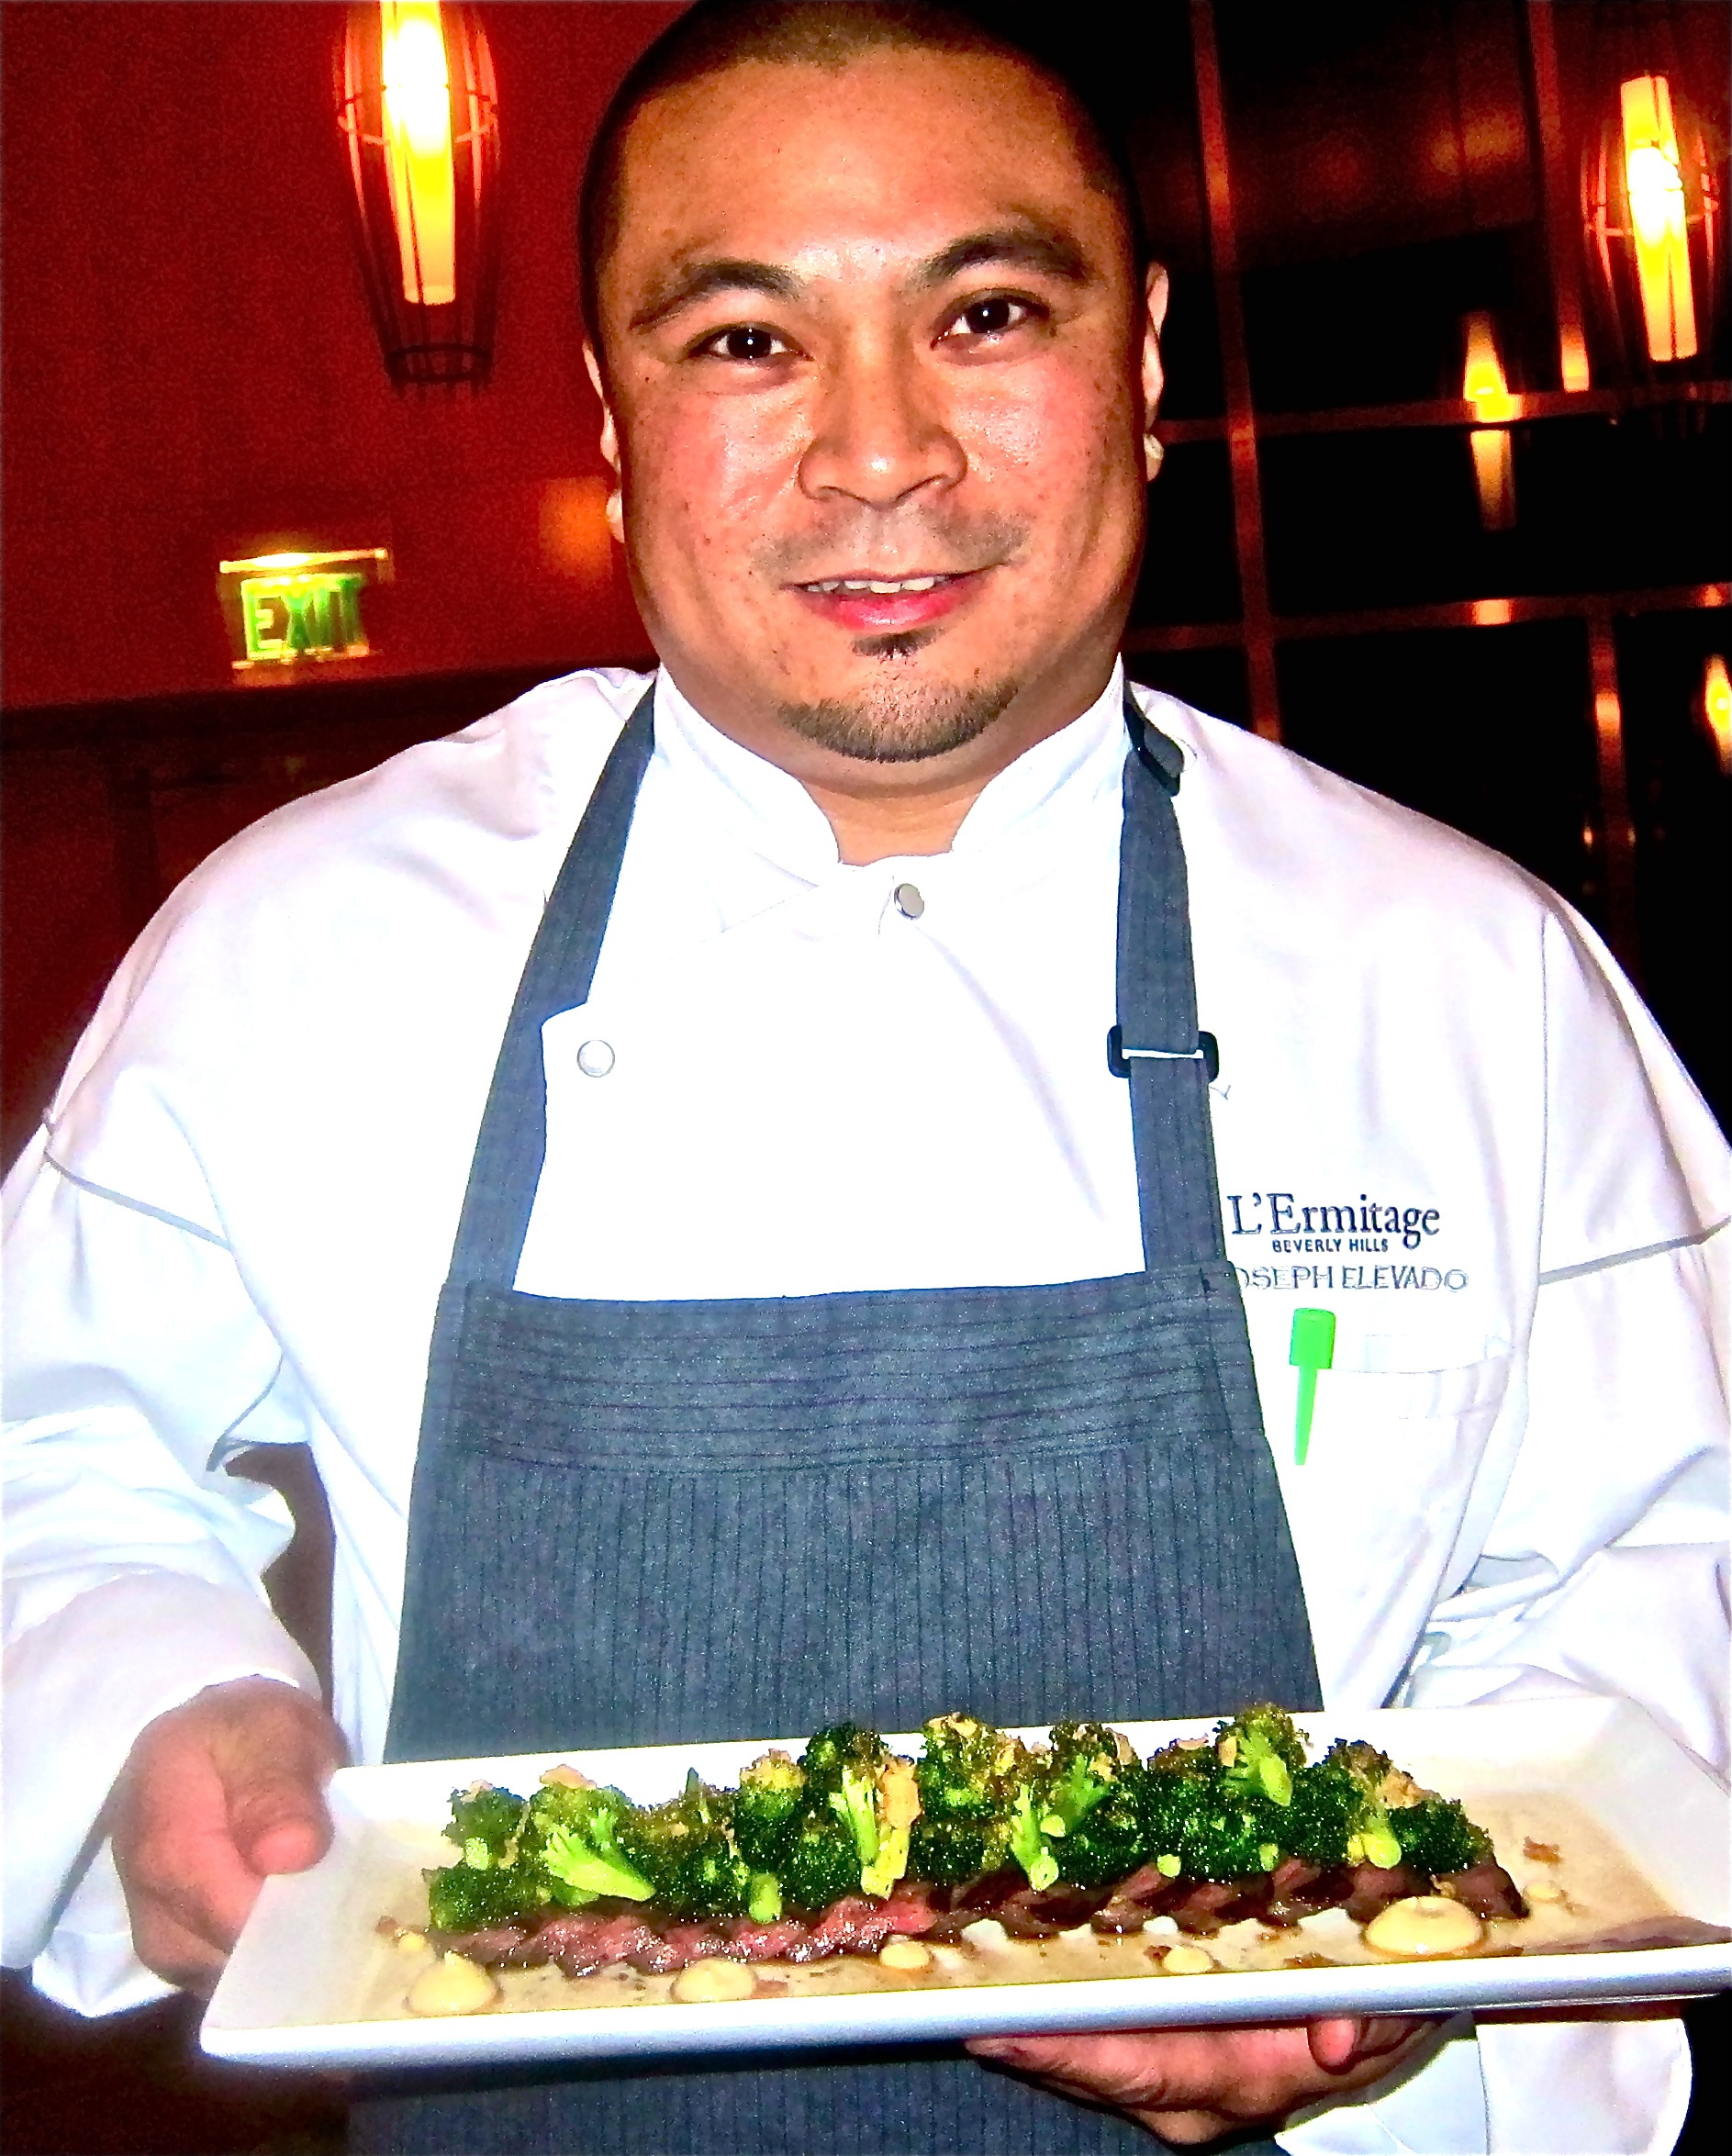 Chef Joseph Elevado